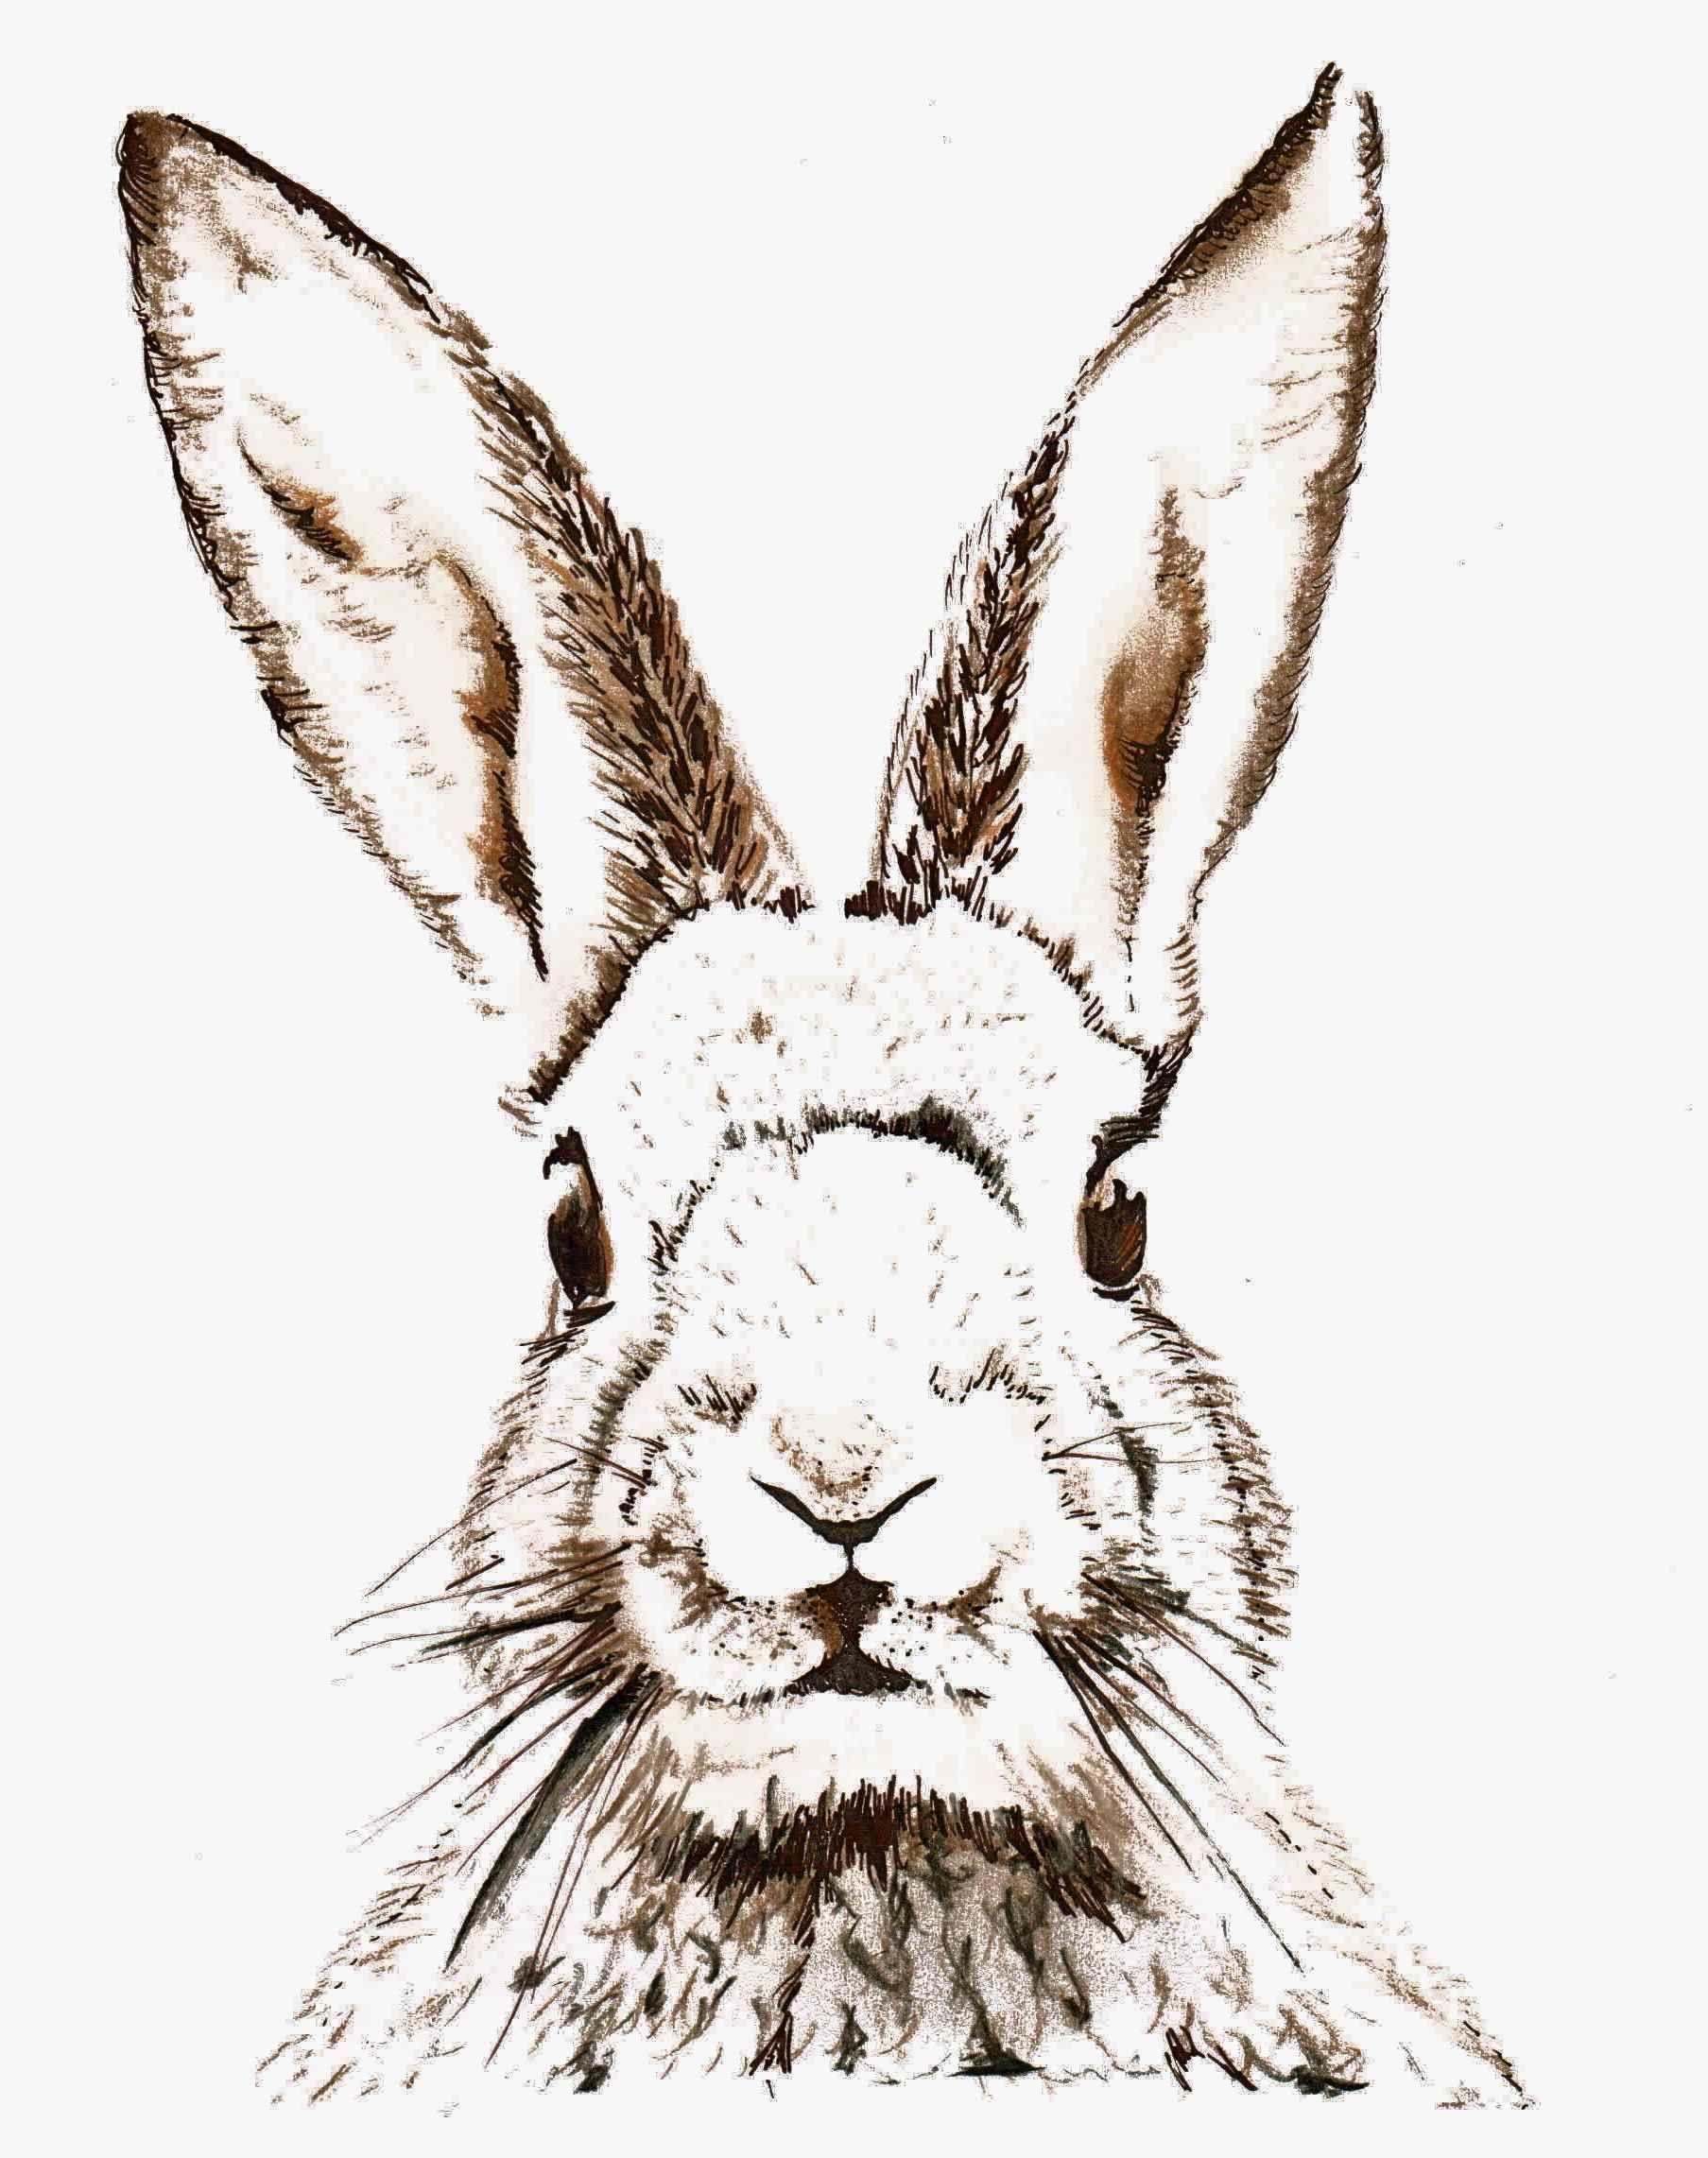 Free Easter Printable & Vintage Clip Art   Free Printables - Free Printable Vintage Easter Images